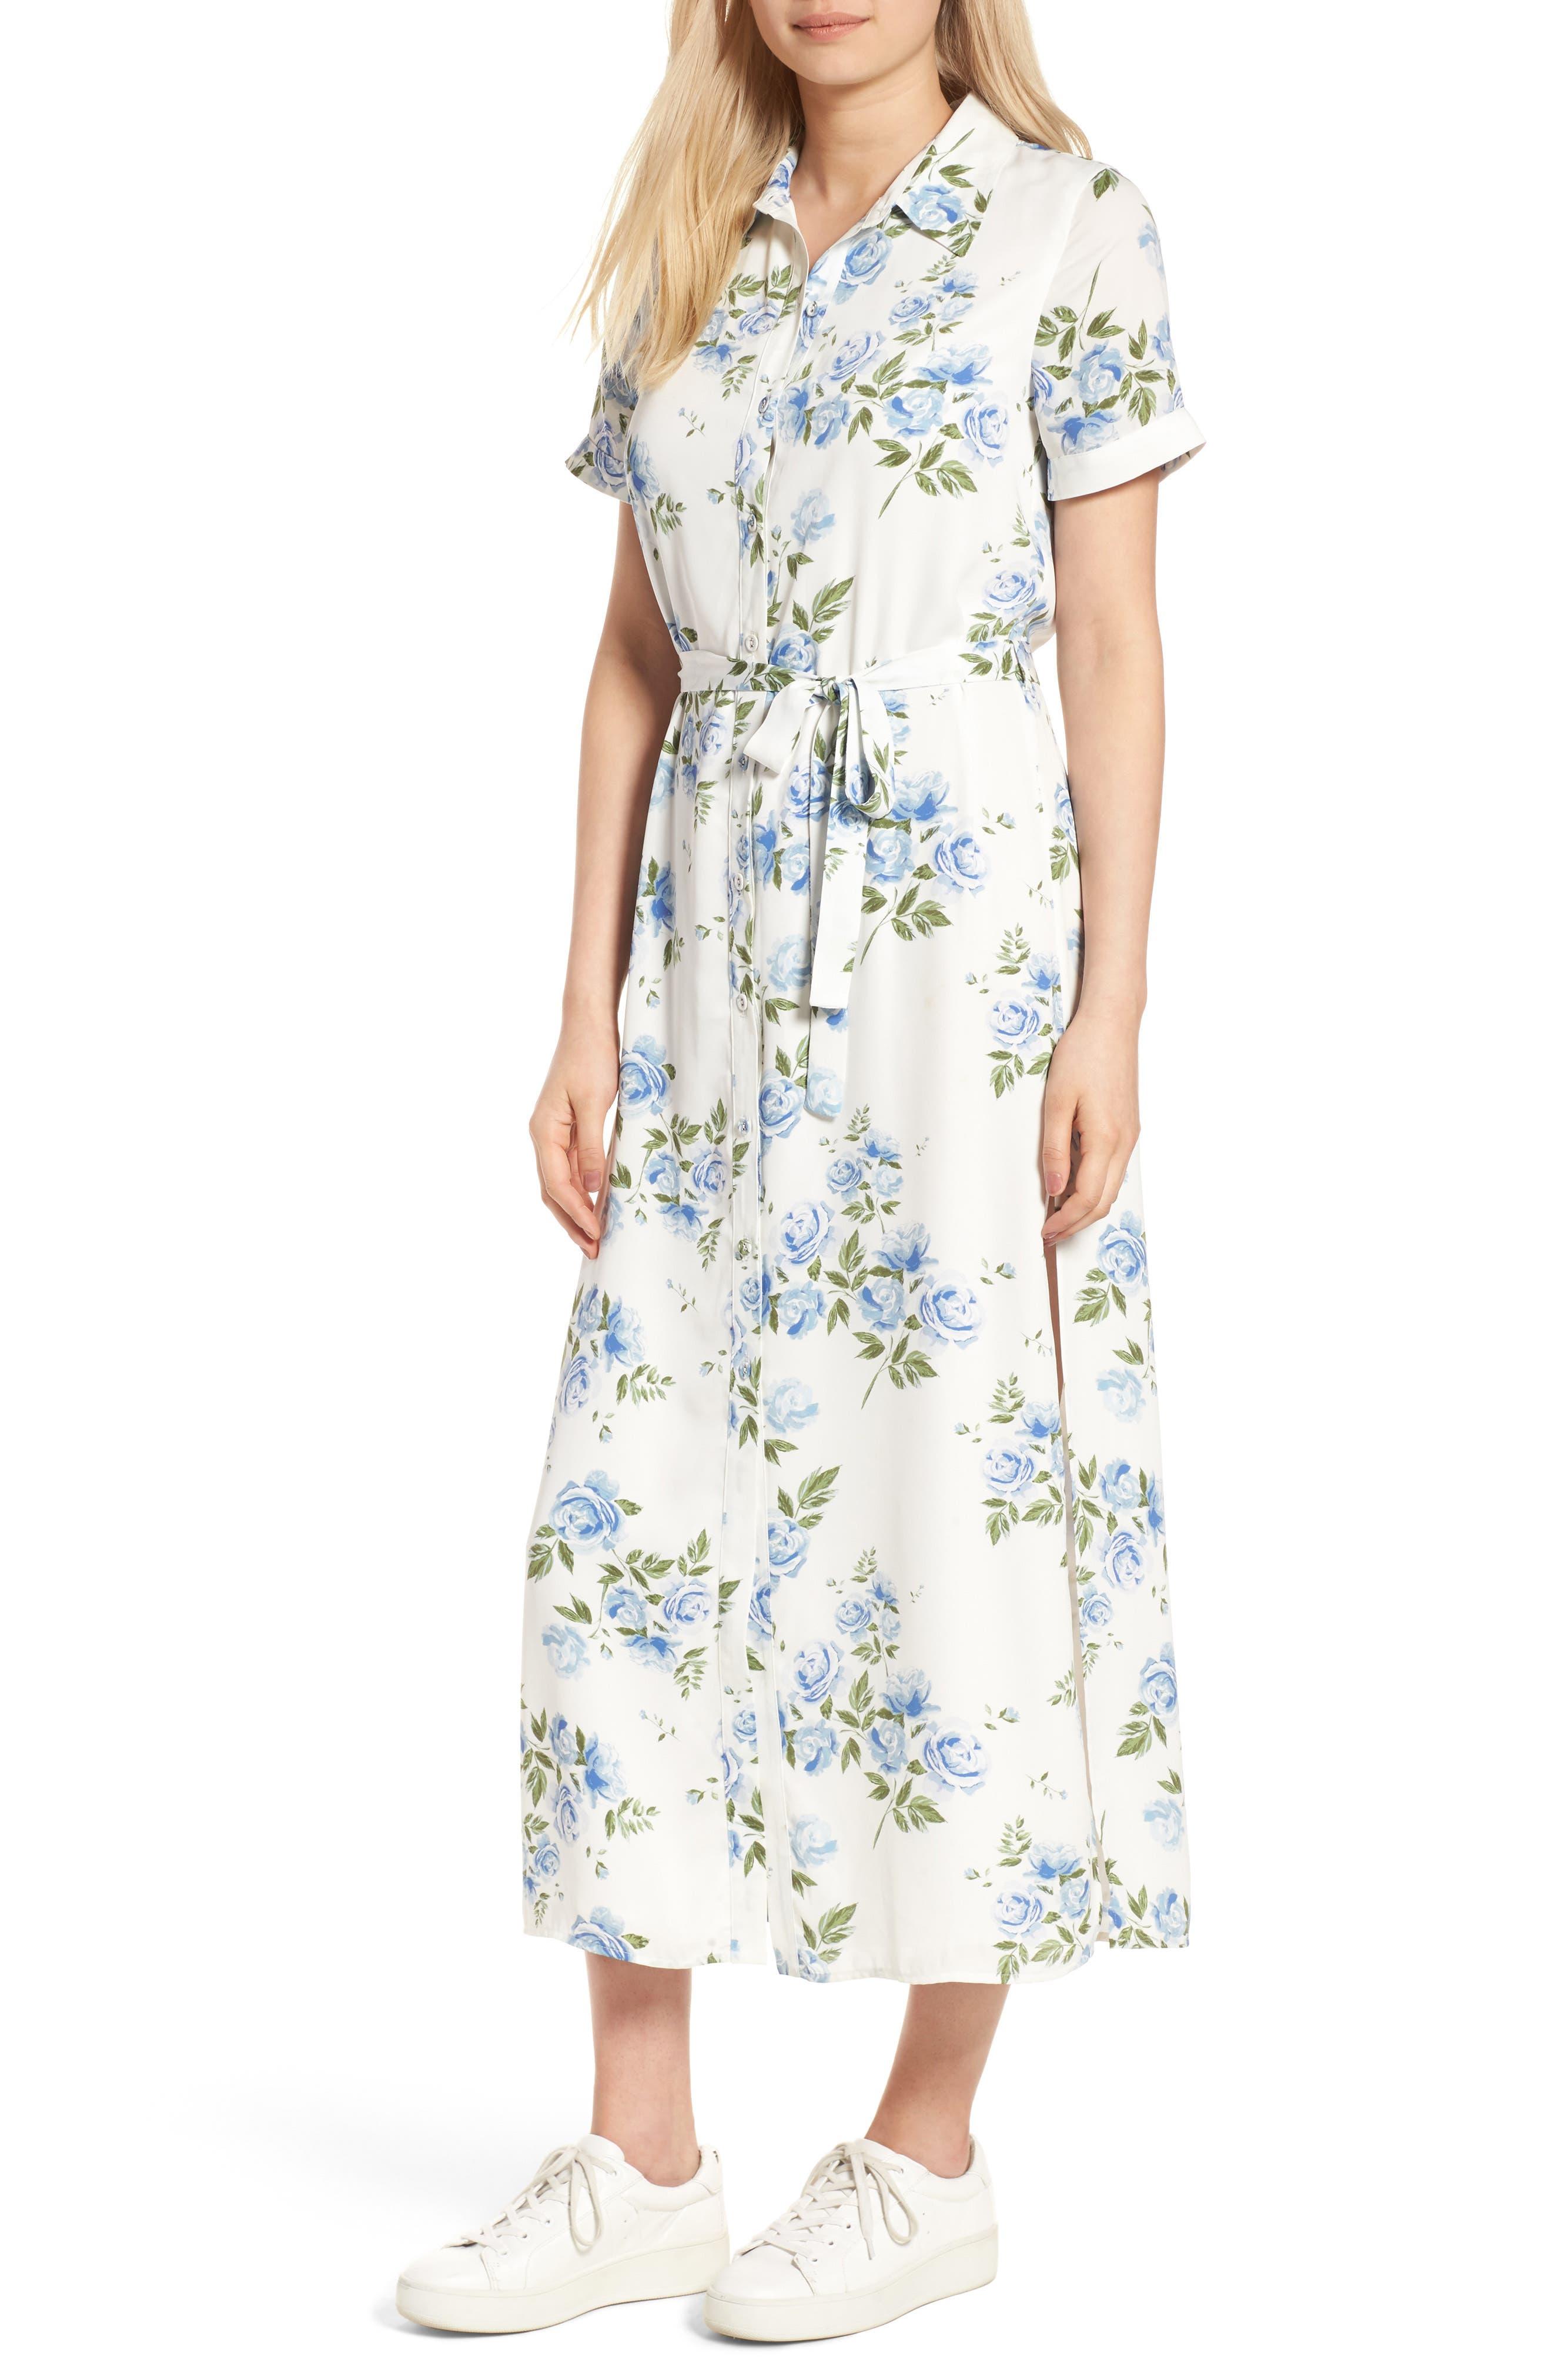 LACADEMIE LAcademie Womens Apparel The Maxi Shirt Dress